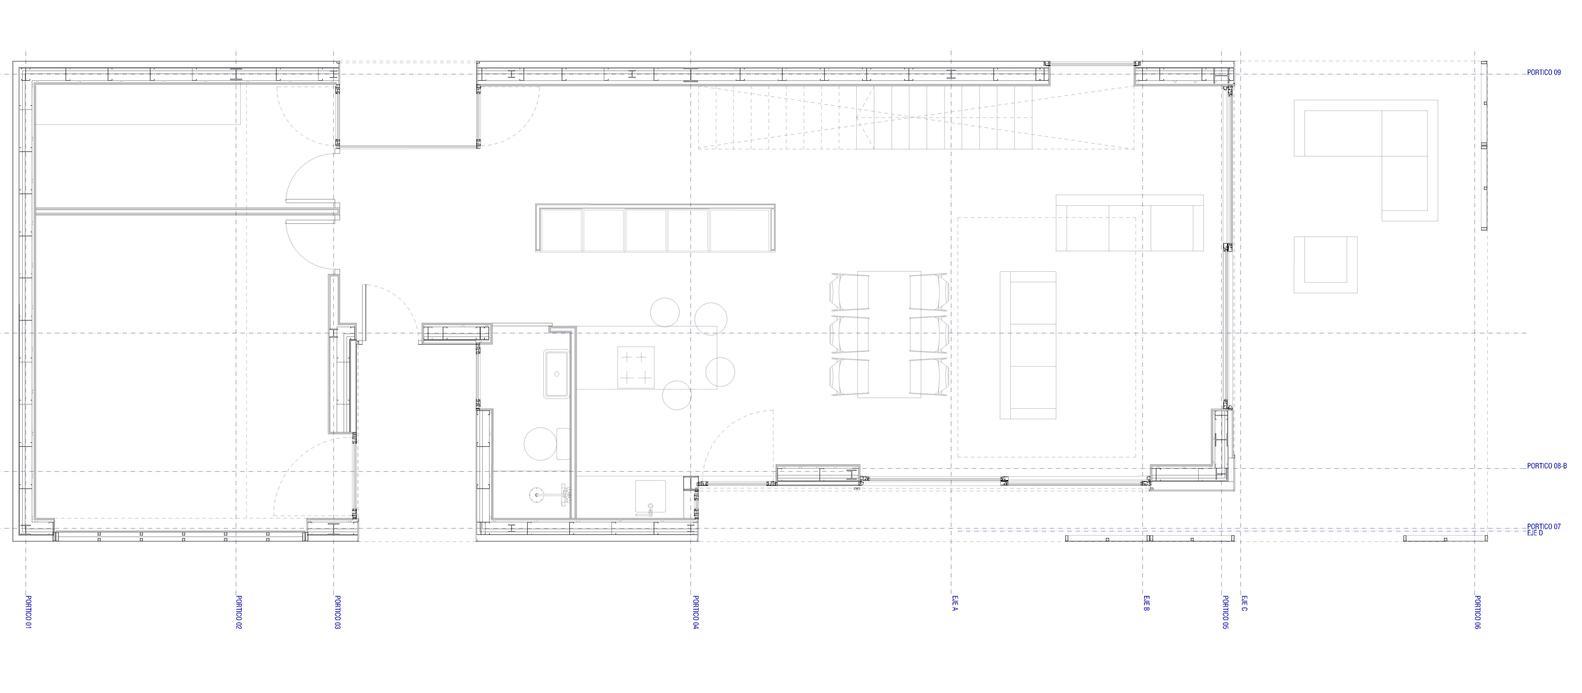 Bố trí mặt bằng tầng trệt - Castelldefels House